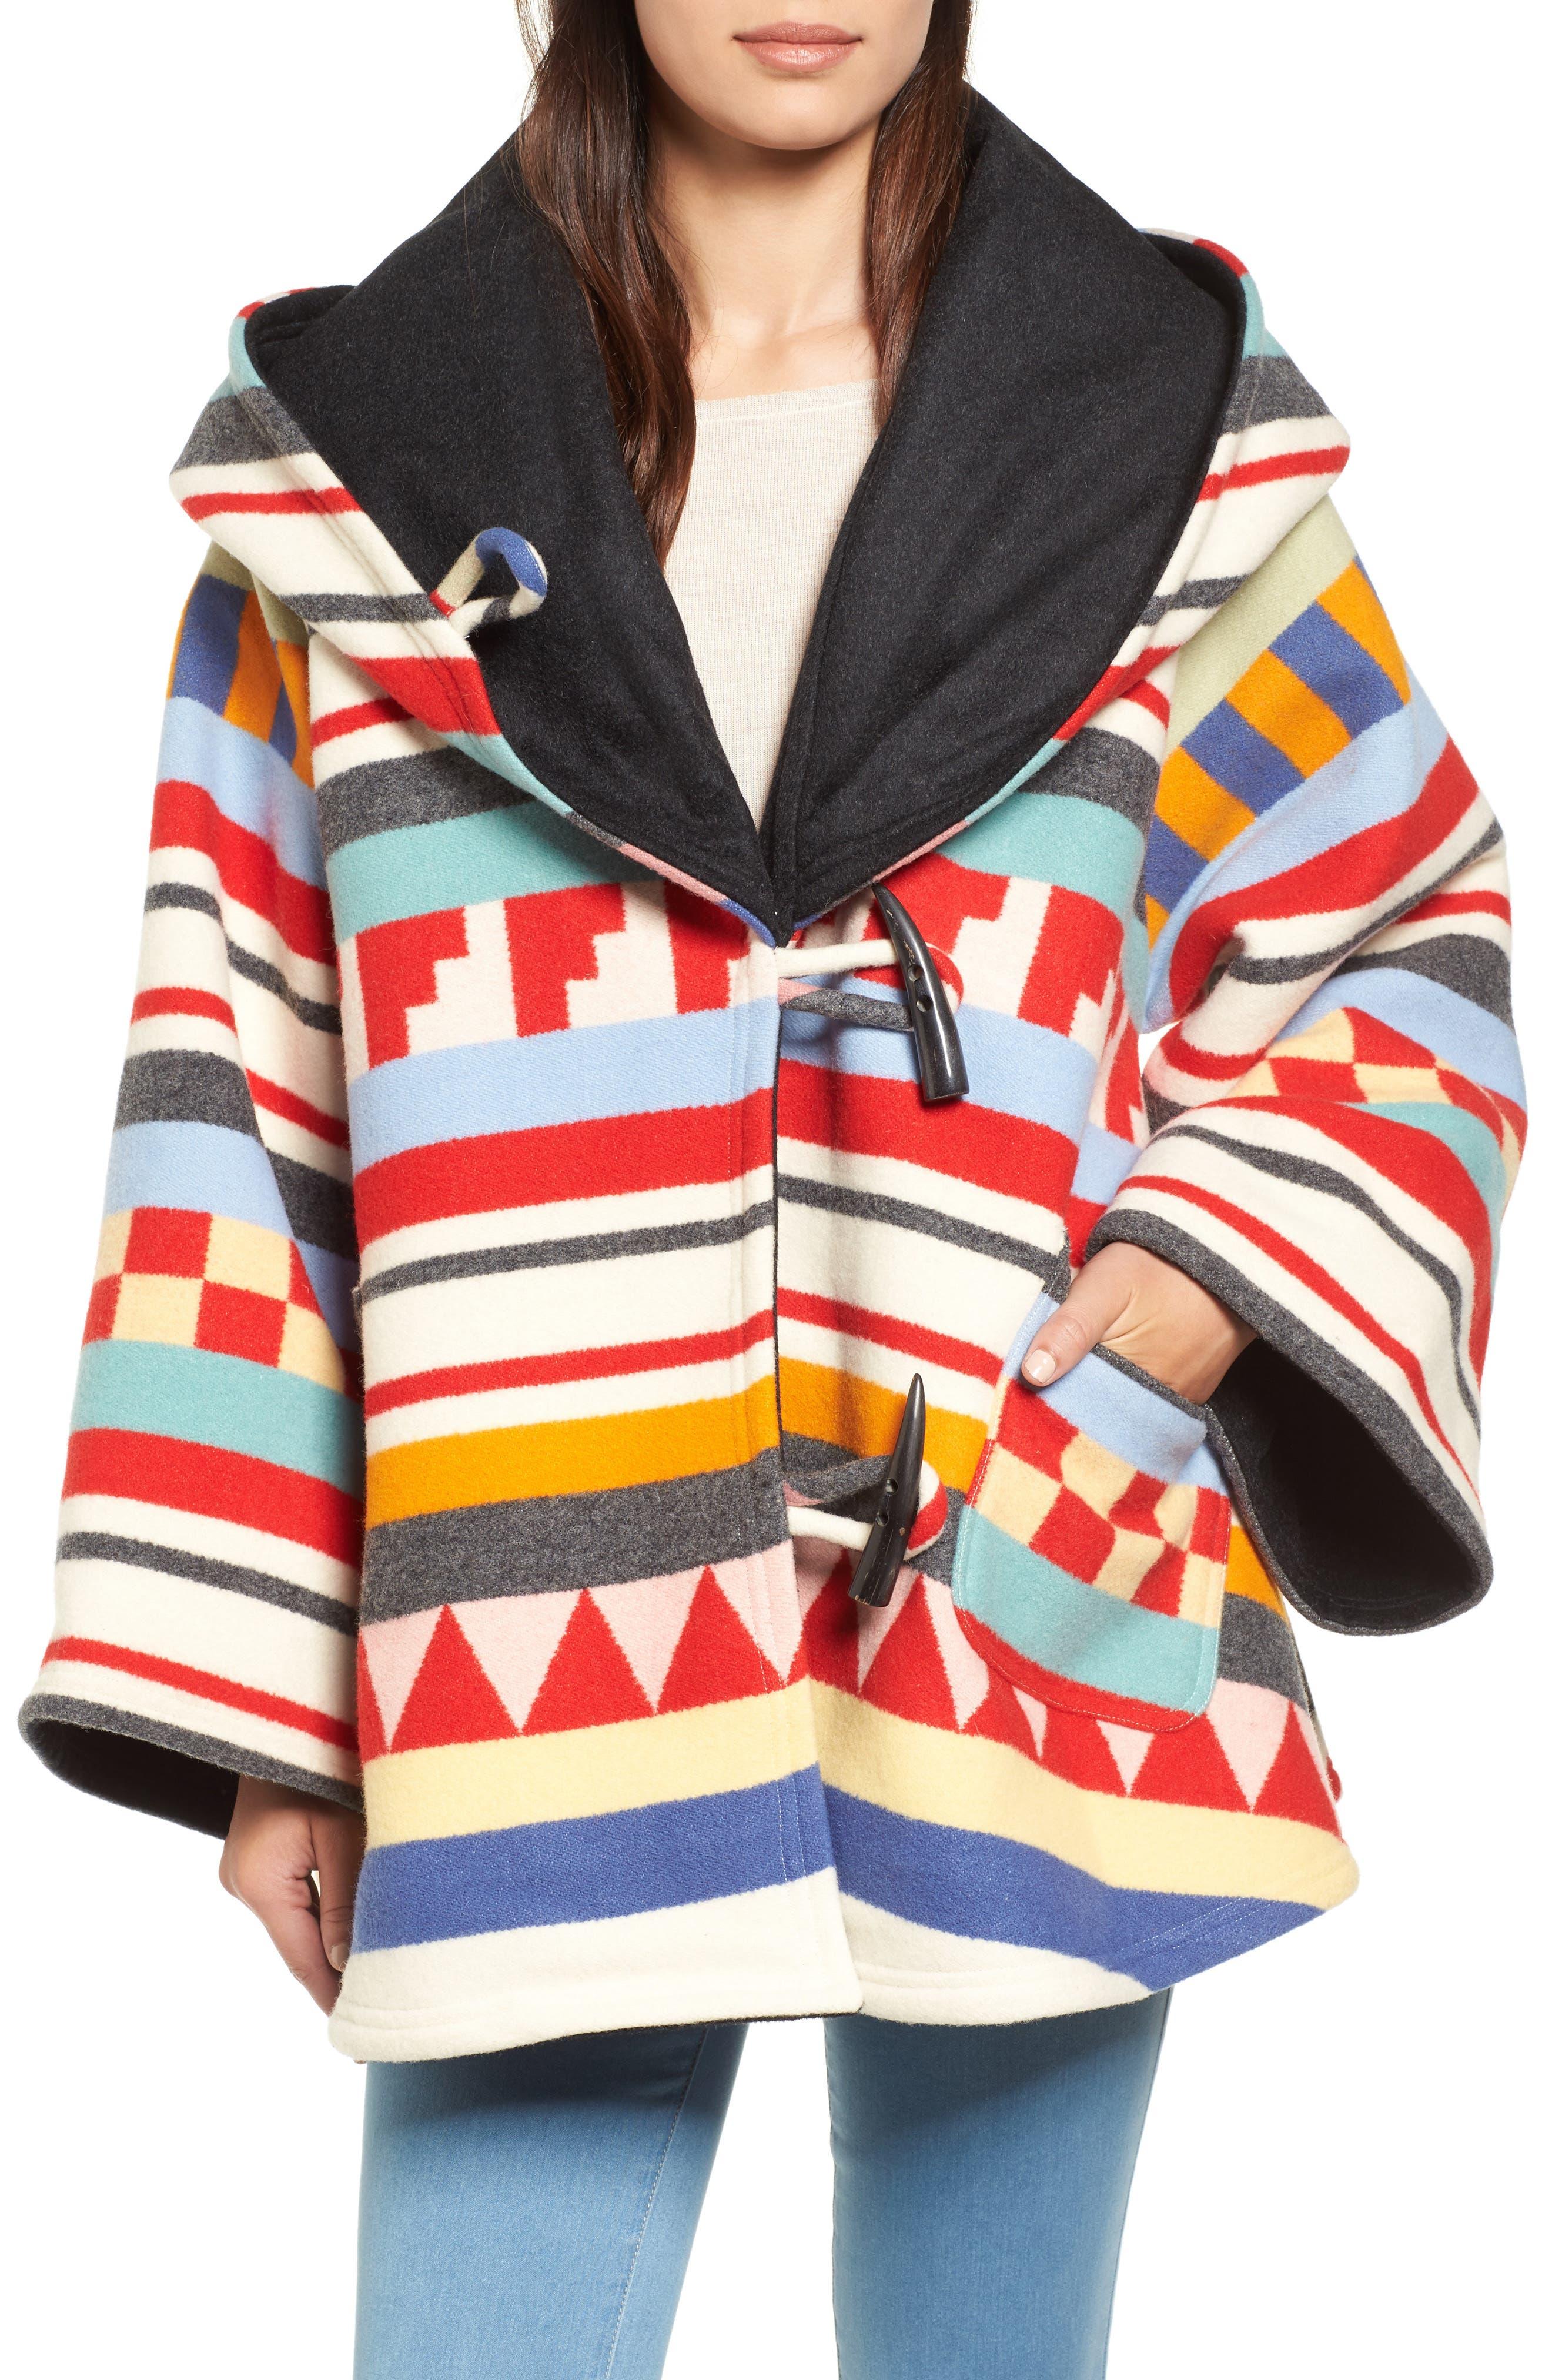 x Pendleton Wool Blend Hooded Cape,                         Main,                         color, WHITE MULTI